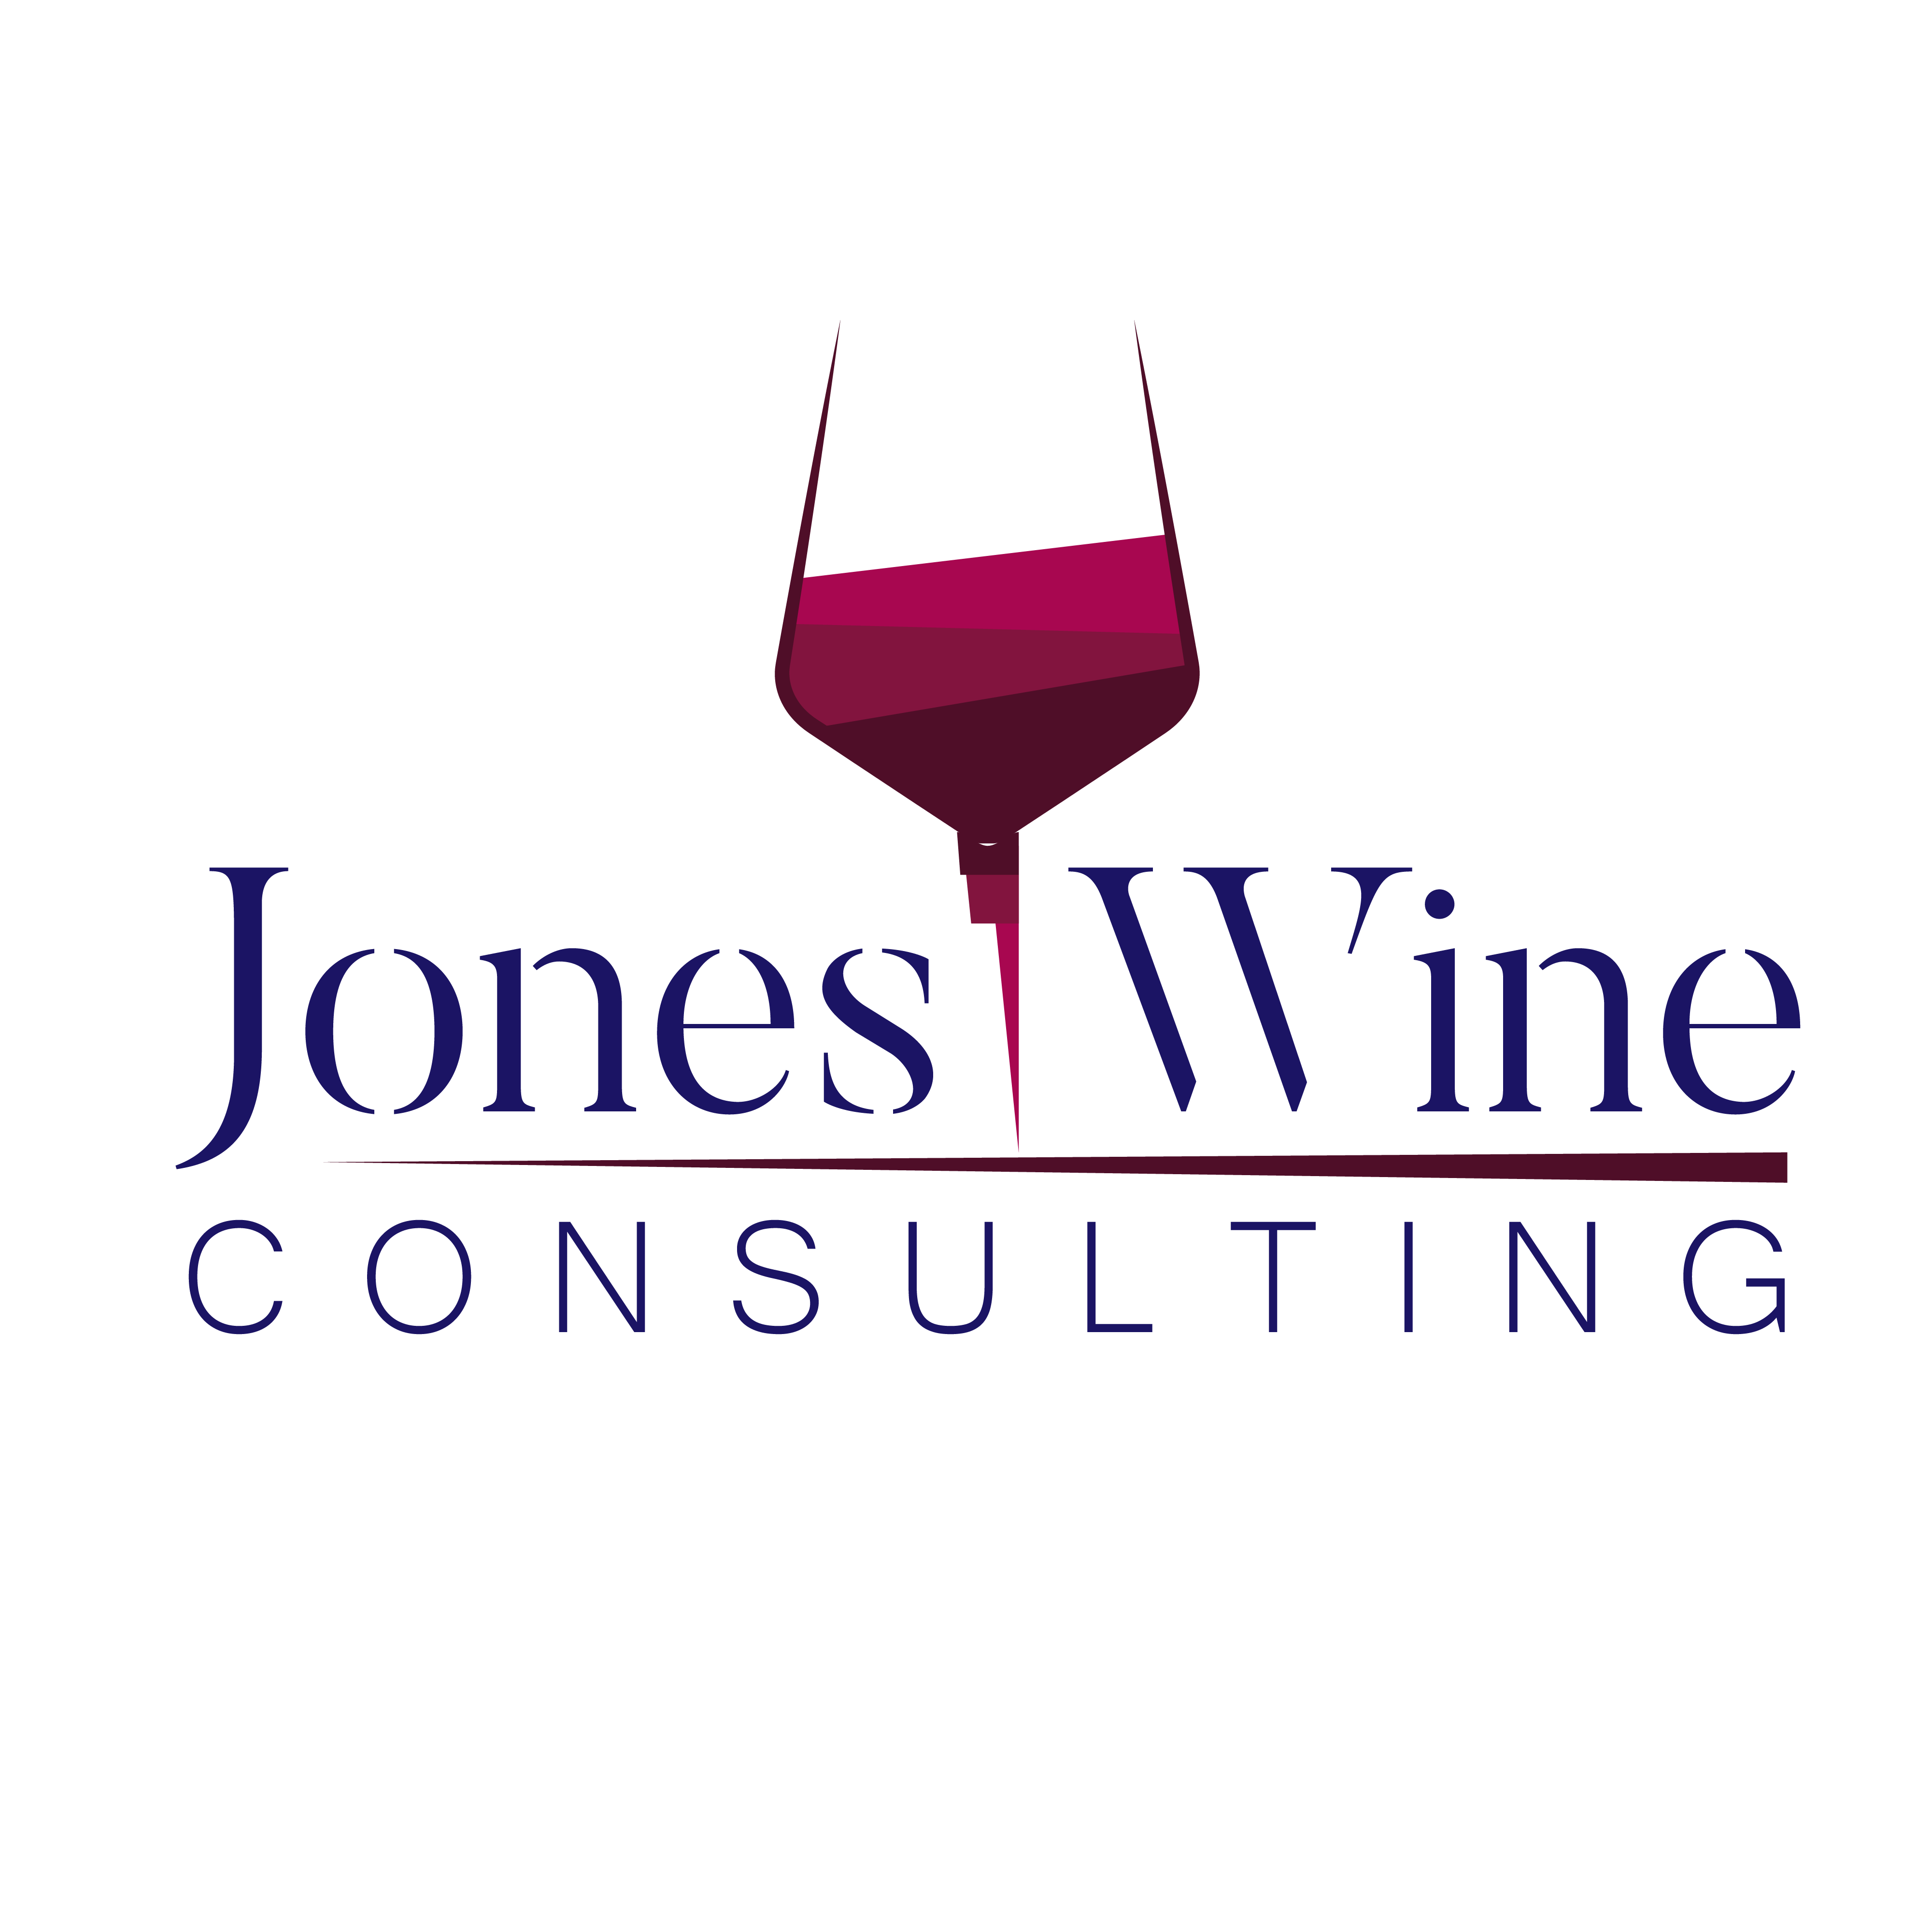 Jones Wine Consulting